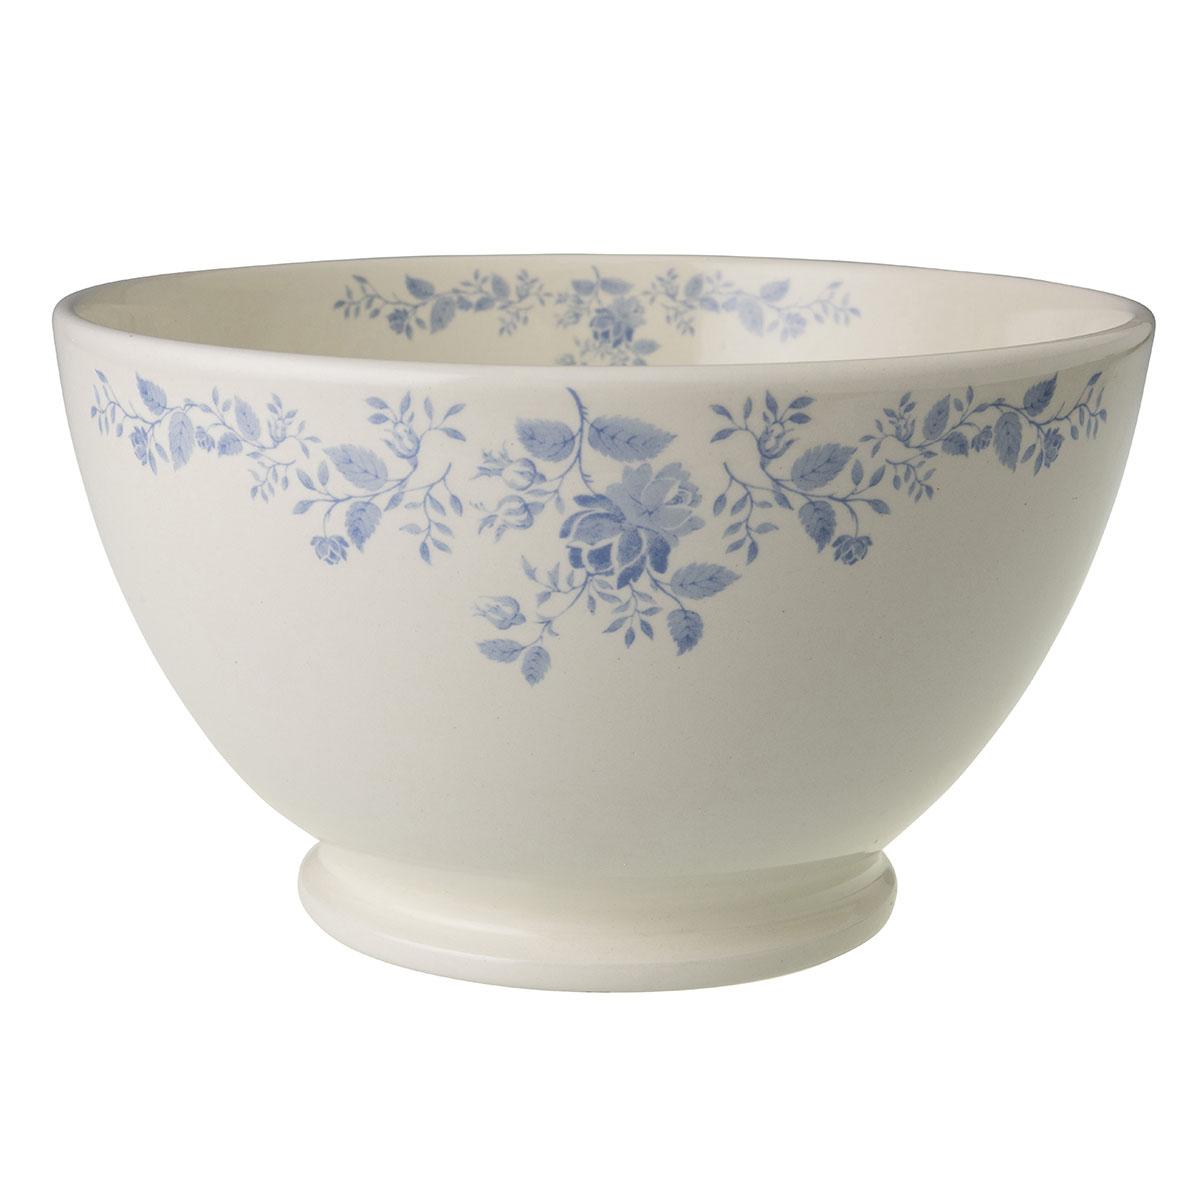 Royal Boch Fleurs Bleues Schaal op Voet Decor 22